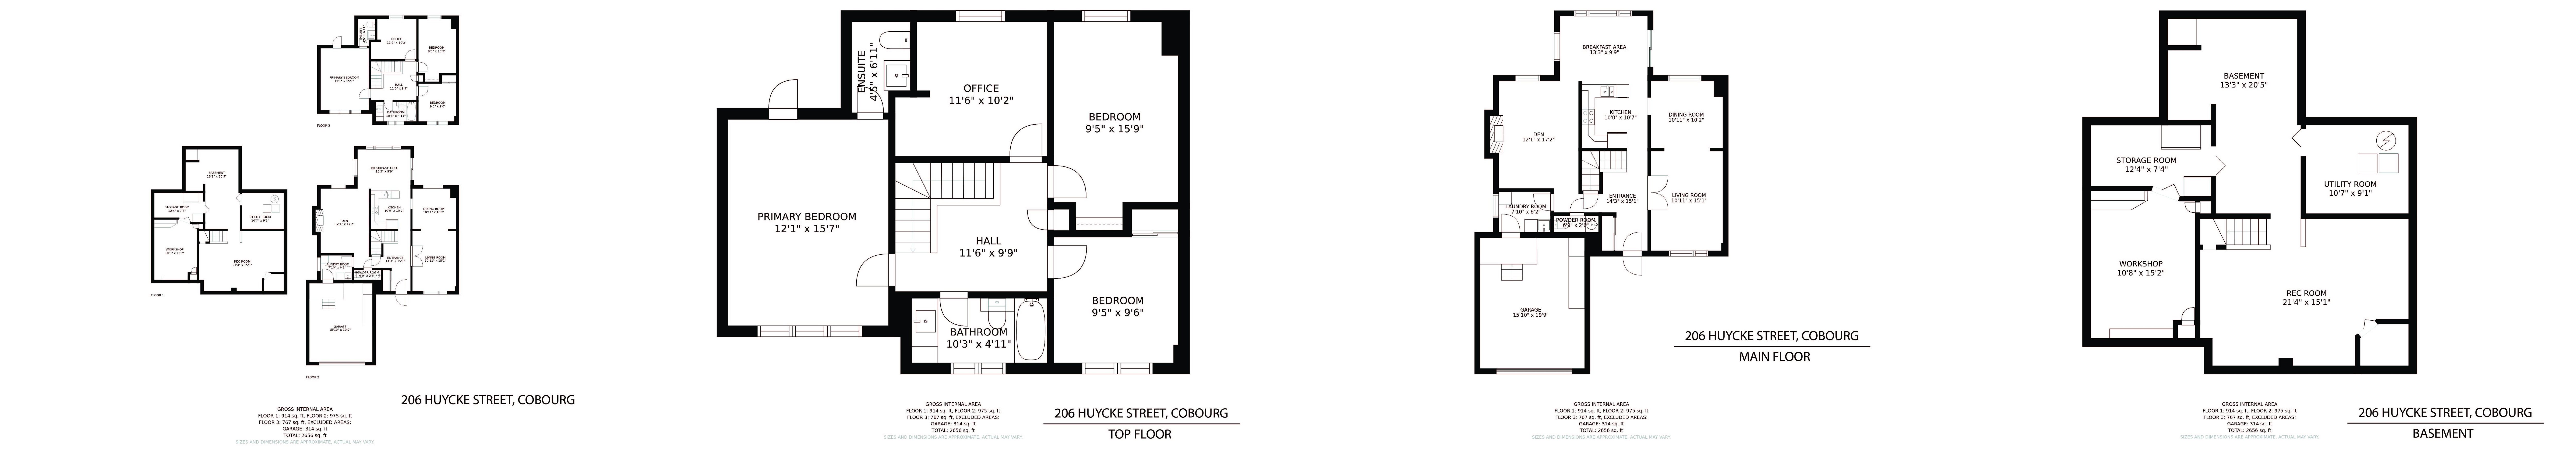 206 Huycke Street floorplan